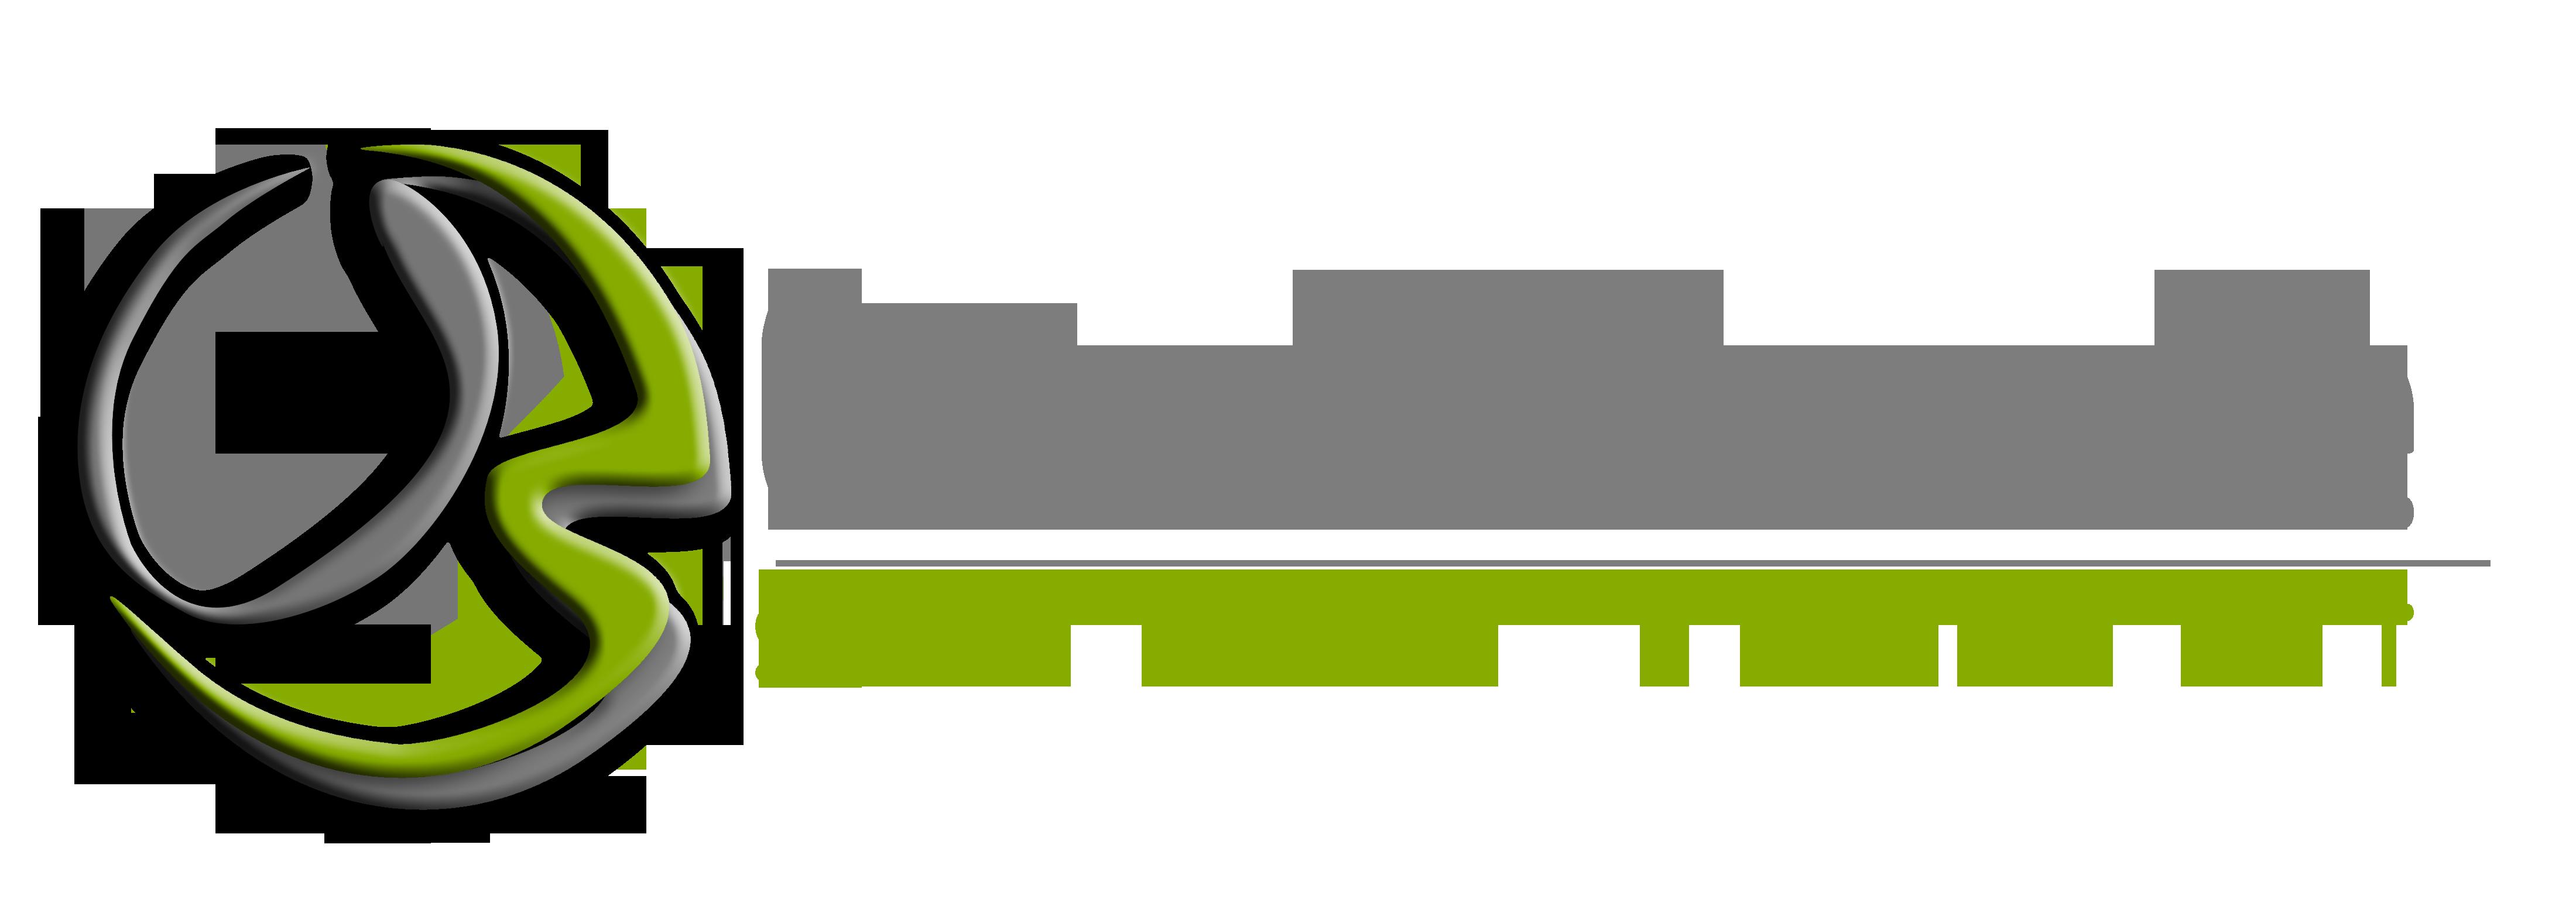 Oscar Blancarte Blog